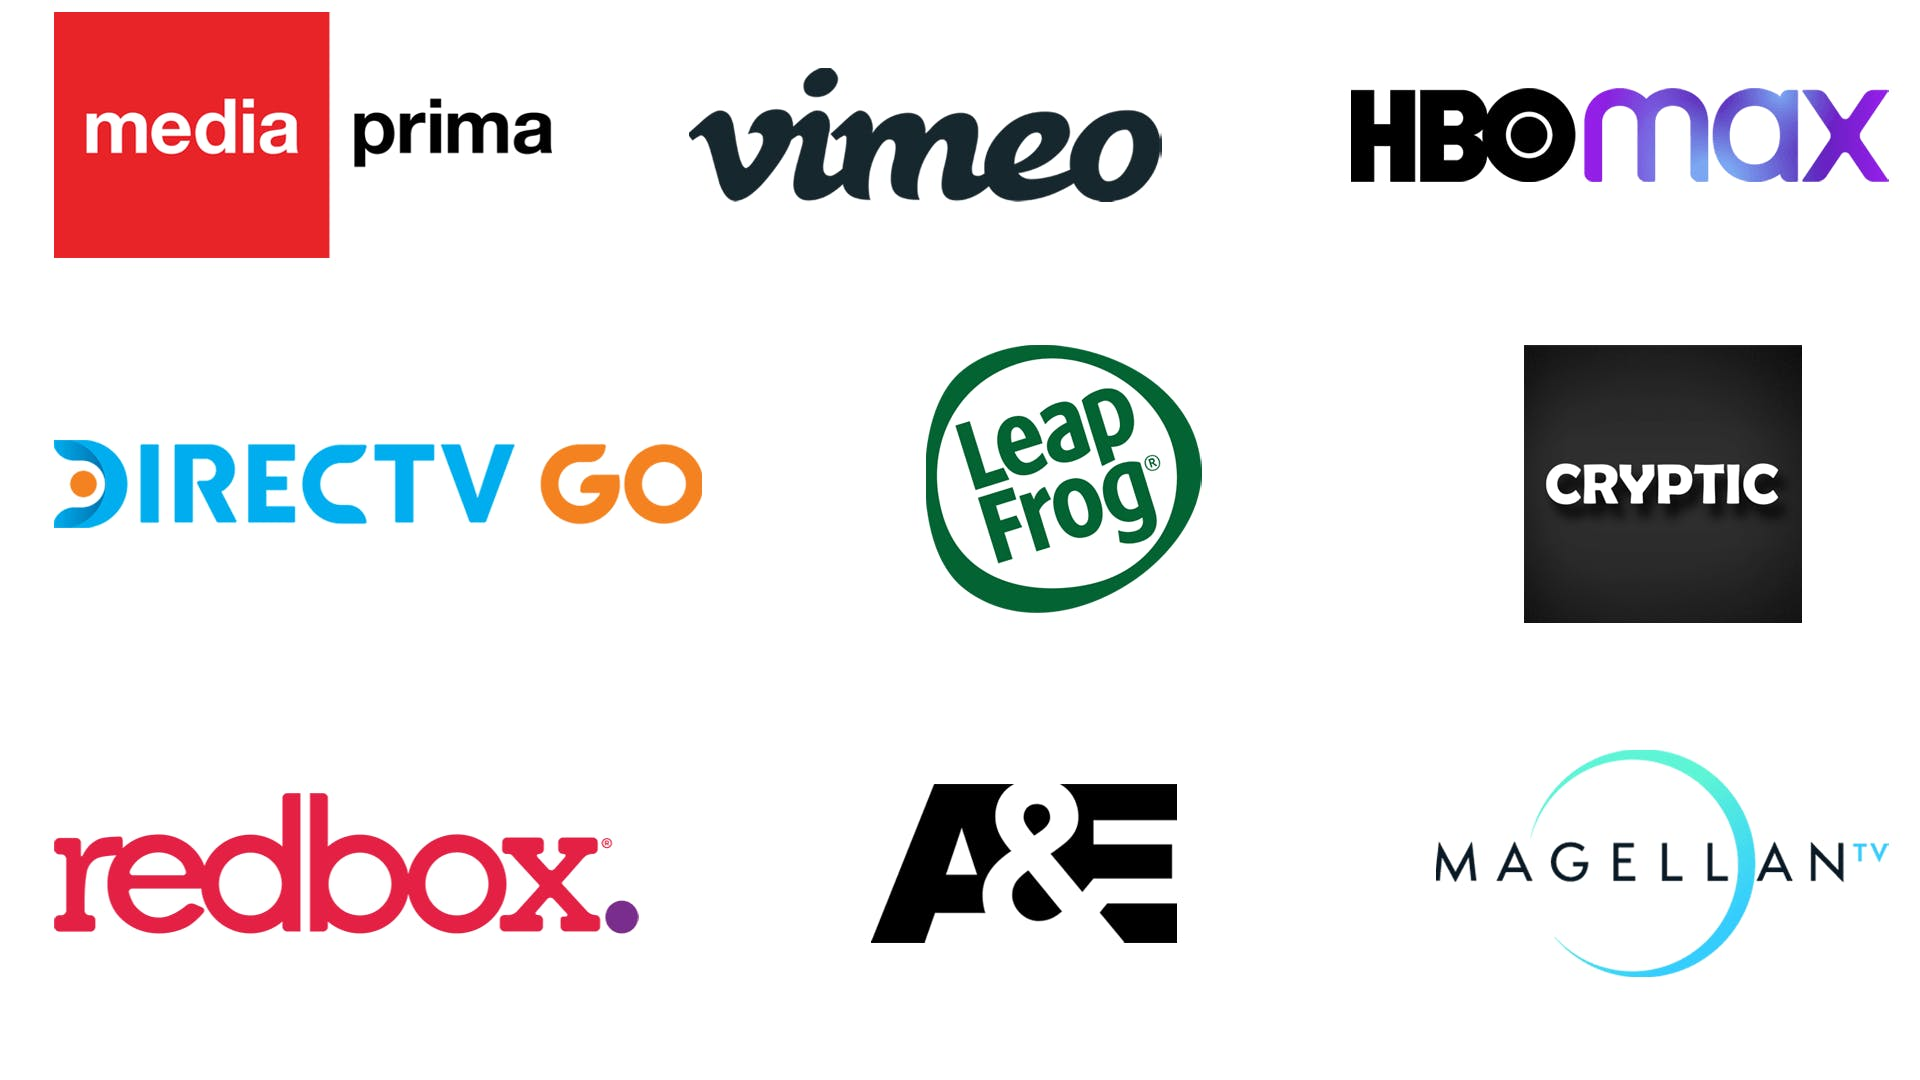 TV, video, gaming, Vimeo, HBO Max, Media prima, DirecTV Go, LeapFrog, Cryptic, Redbox, A&E, Magellan TV